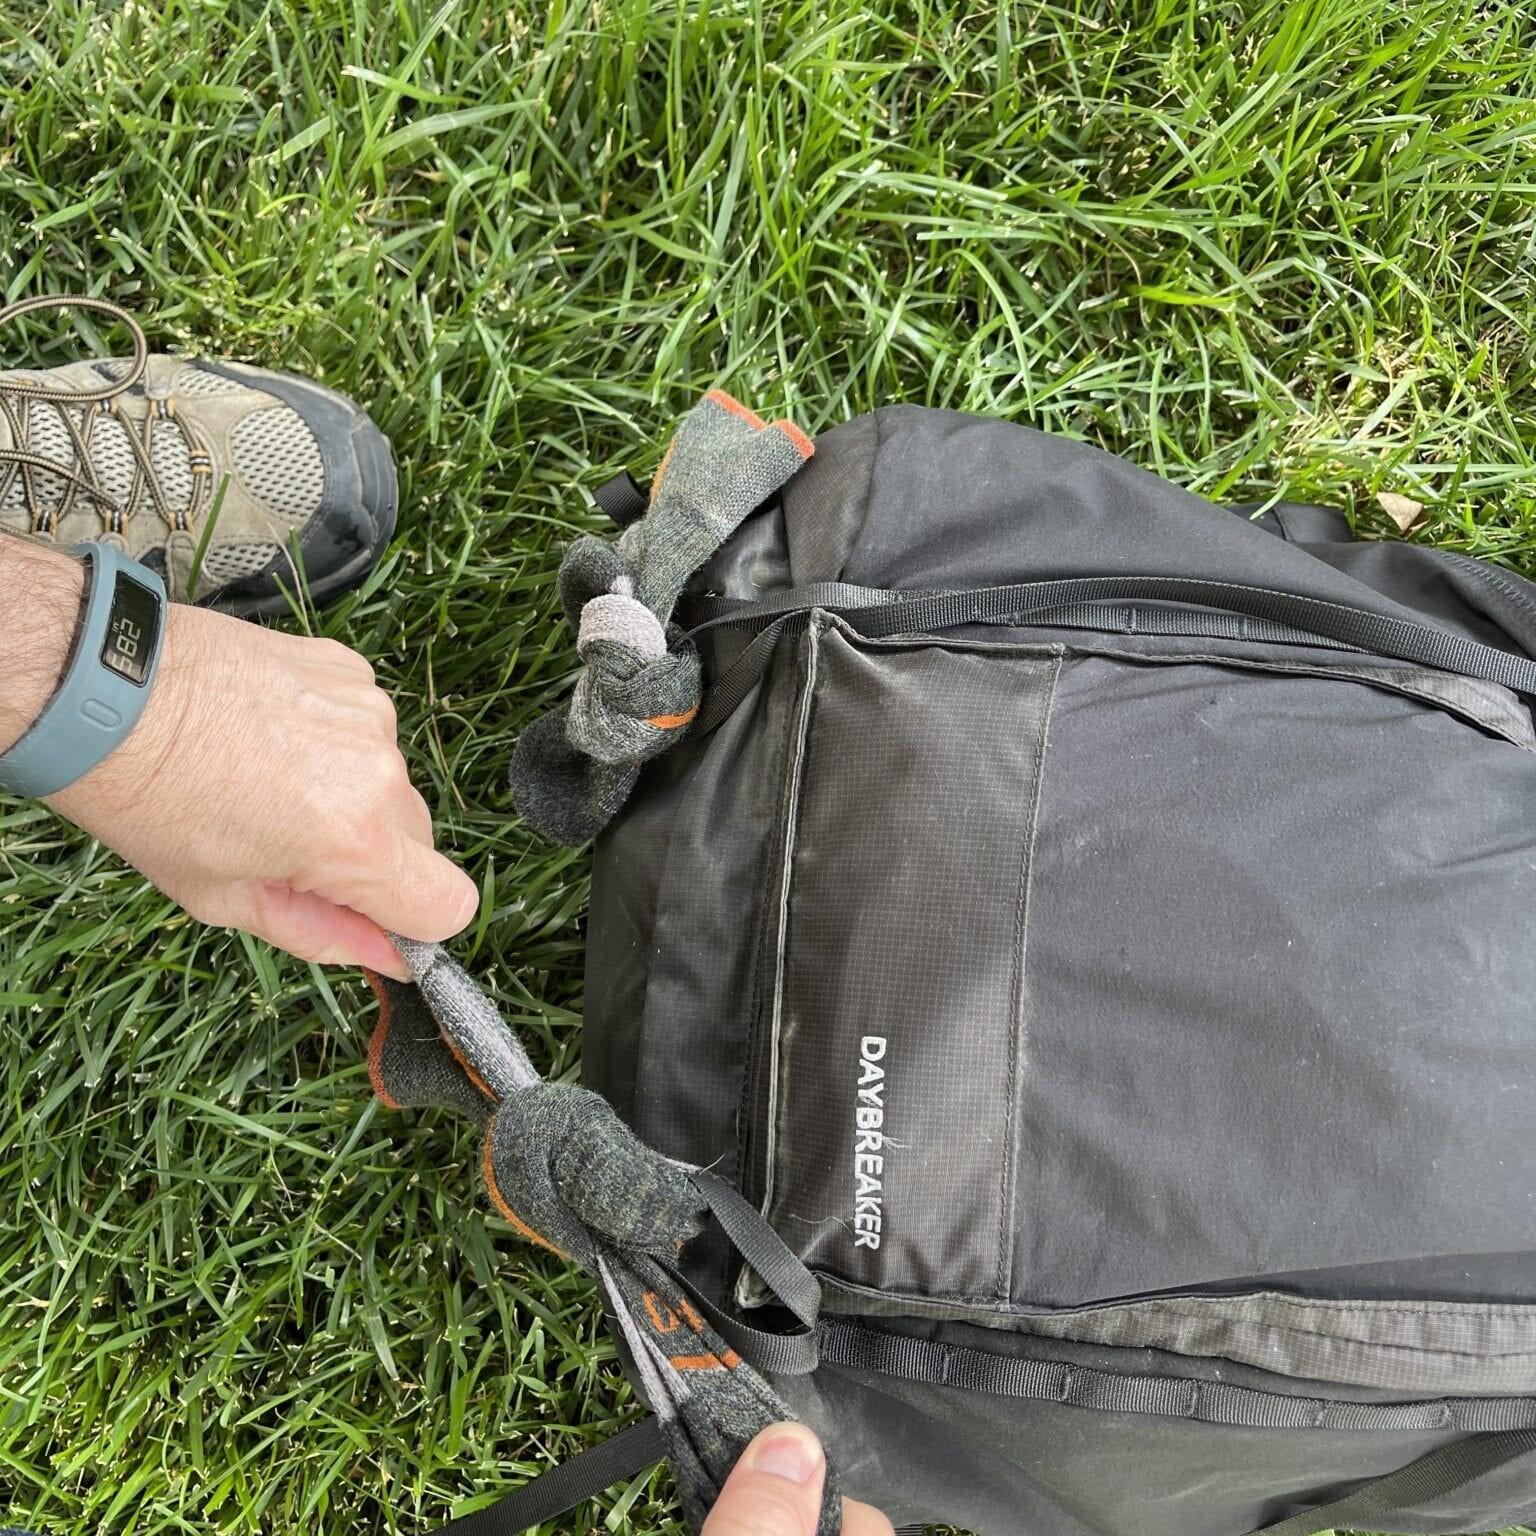 tying socks onto hiker backpack to dry